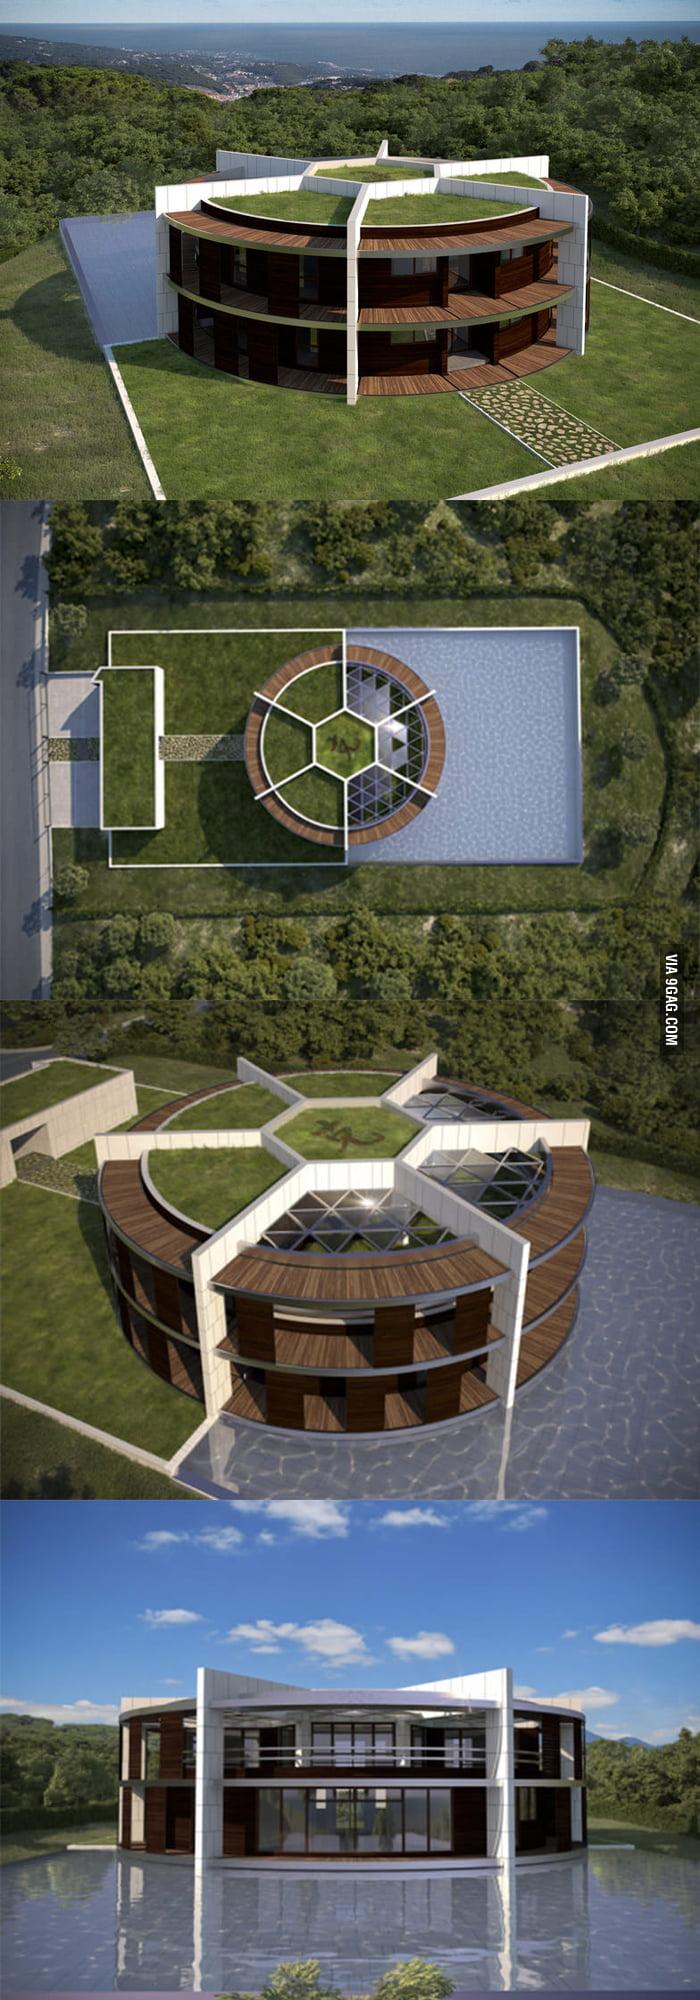 spanish architect has designed a conceptual mansion for lionel messi 9gag. Black Bedroom Furniture Sets. Home Design Ideas